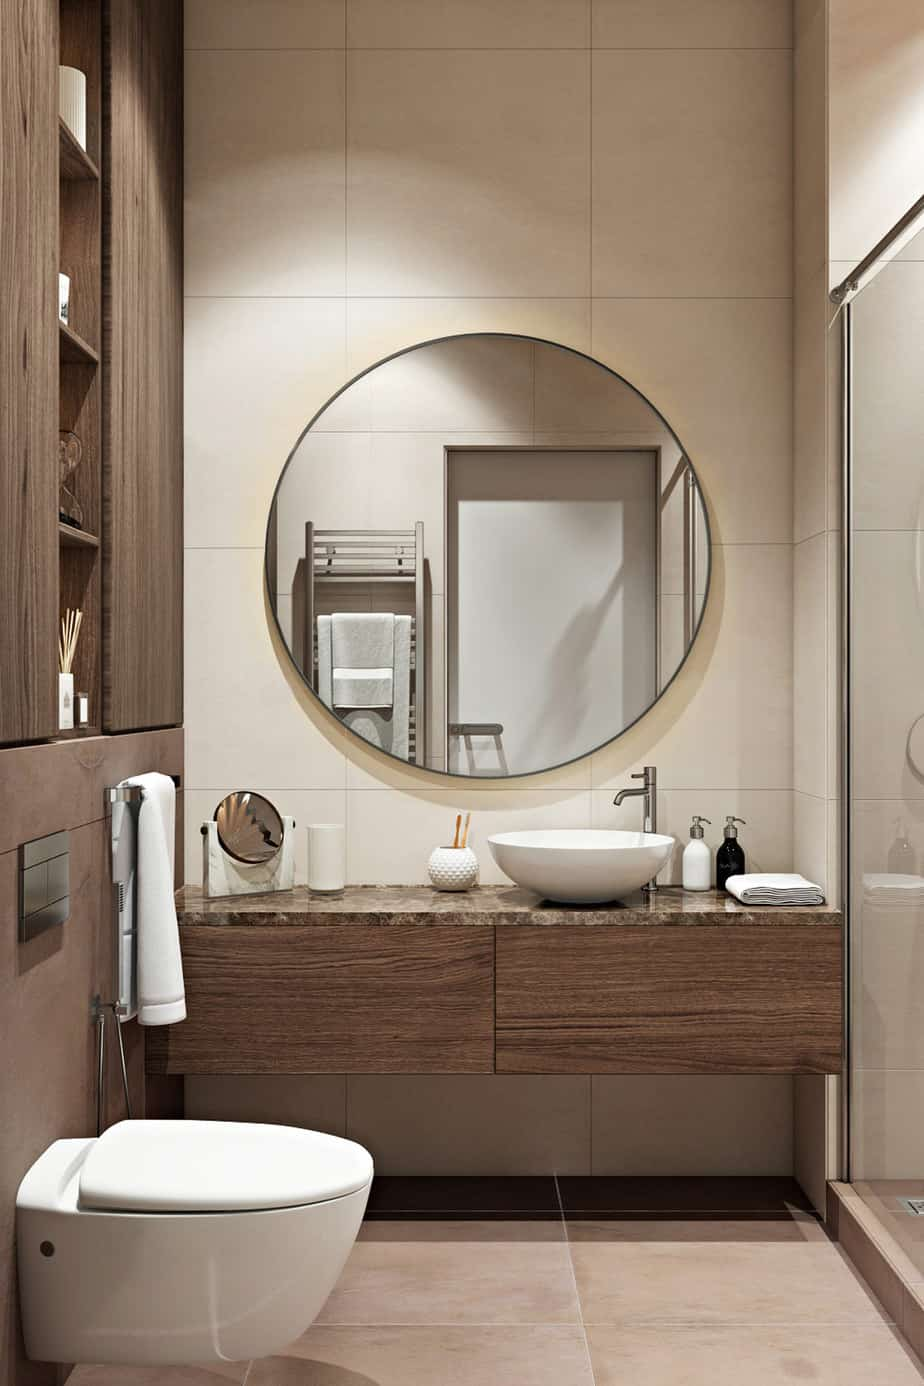 Mirror for Small Bathroom 2021